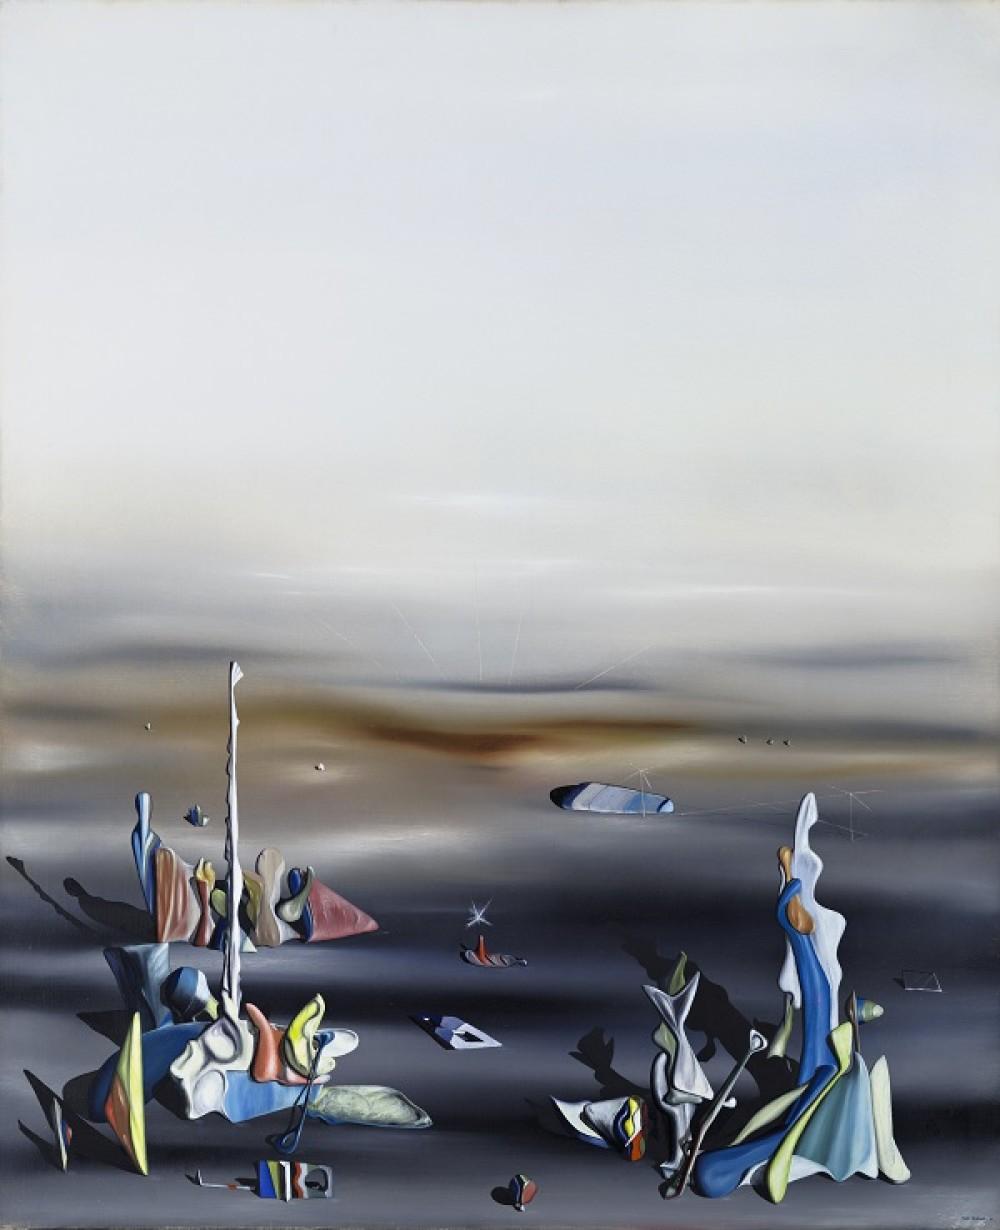 Yves Tanguy - Les cinq etrangers The Five Strangers, 1941